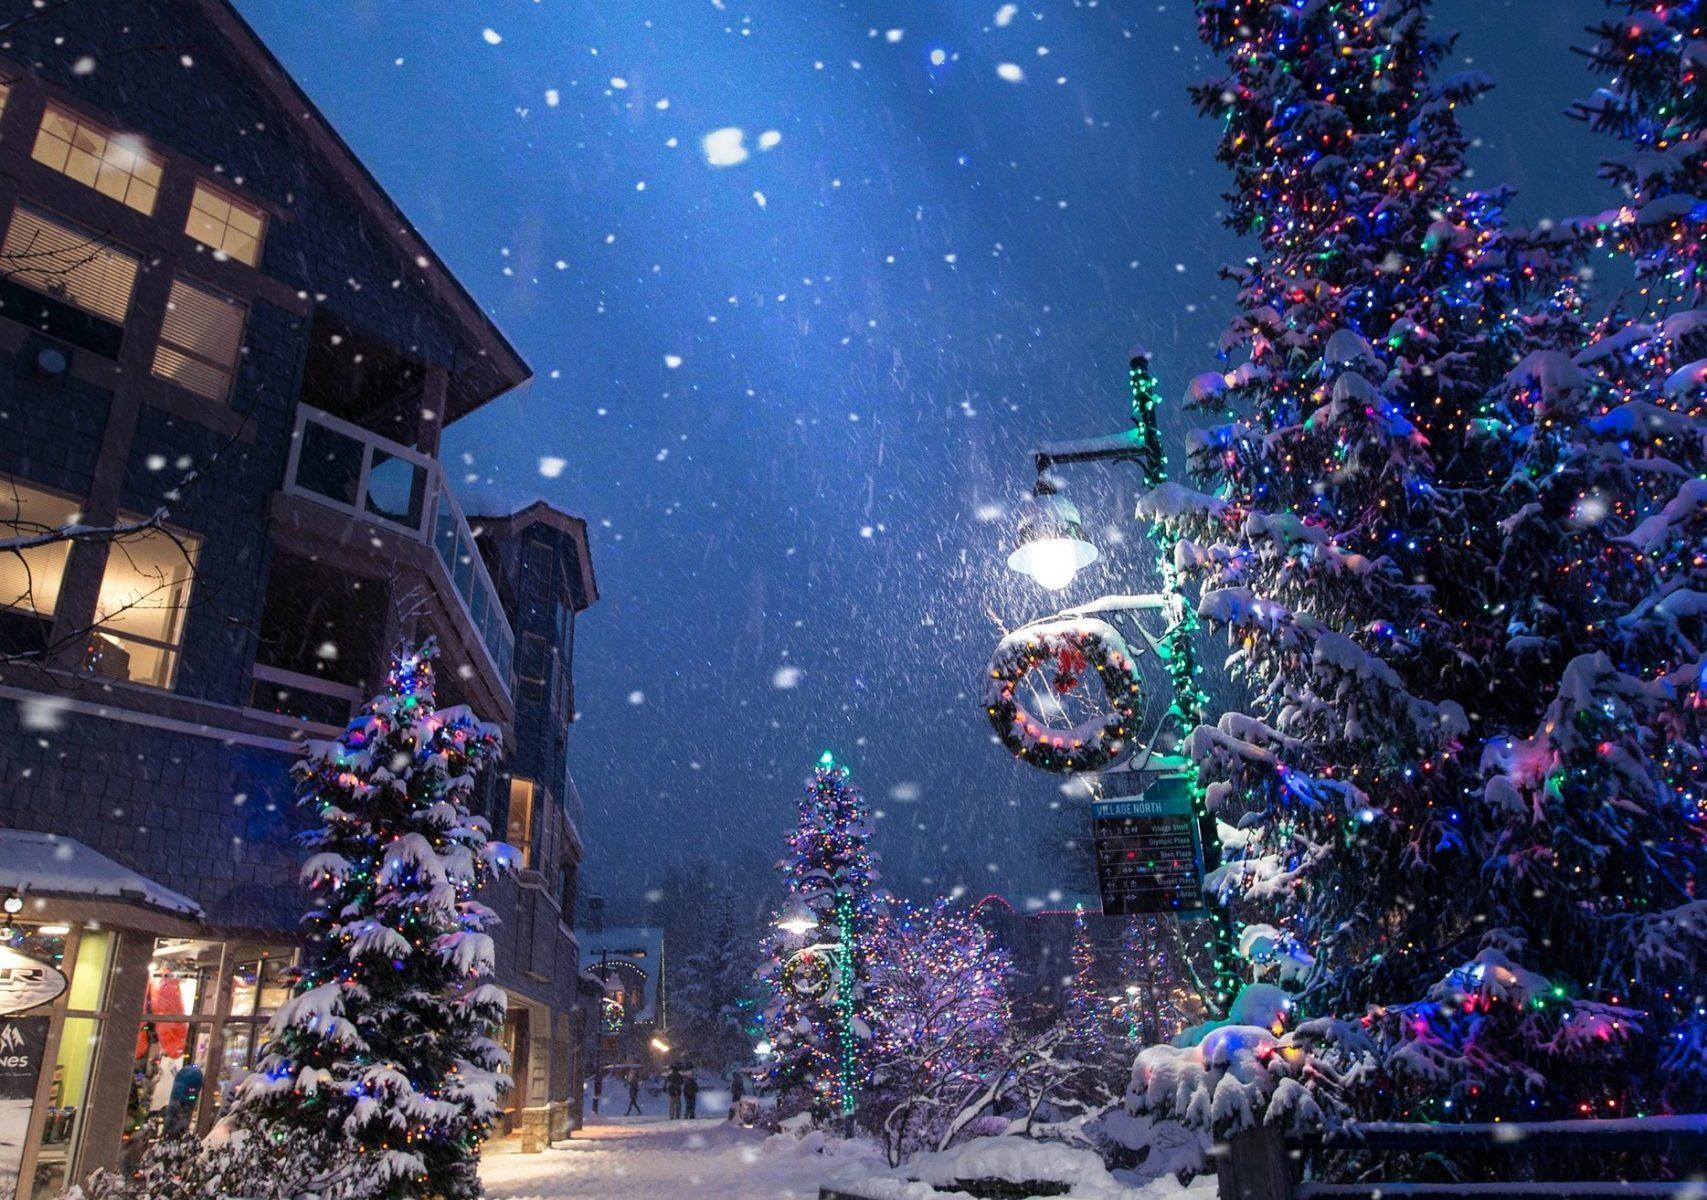 Snowy December Night